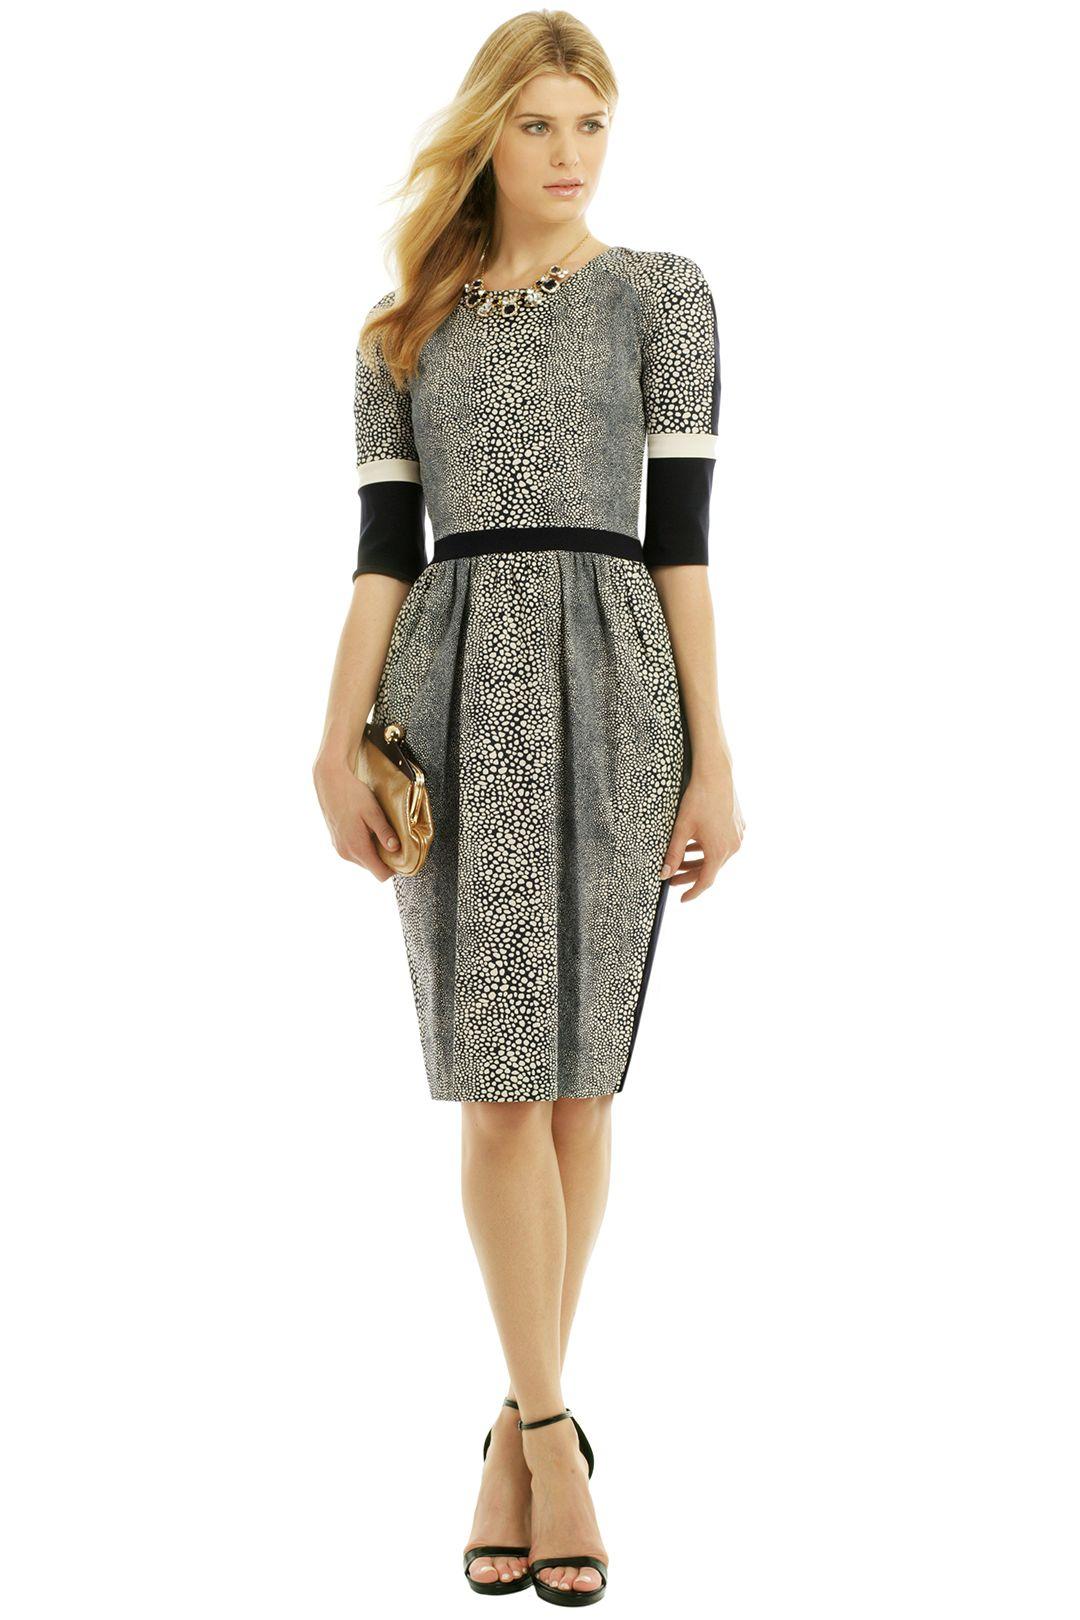 Preen Tilda Dress (Rental: $128)